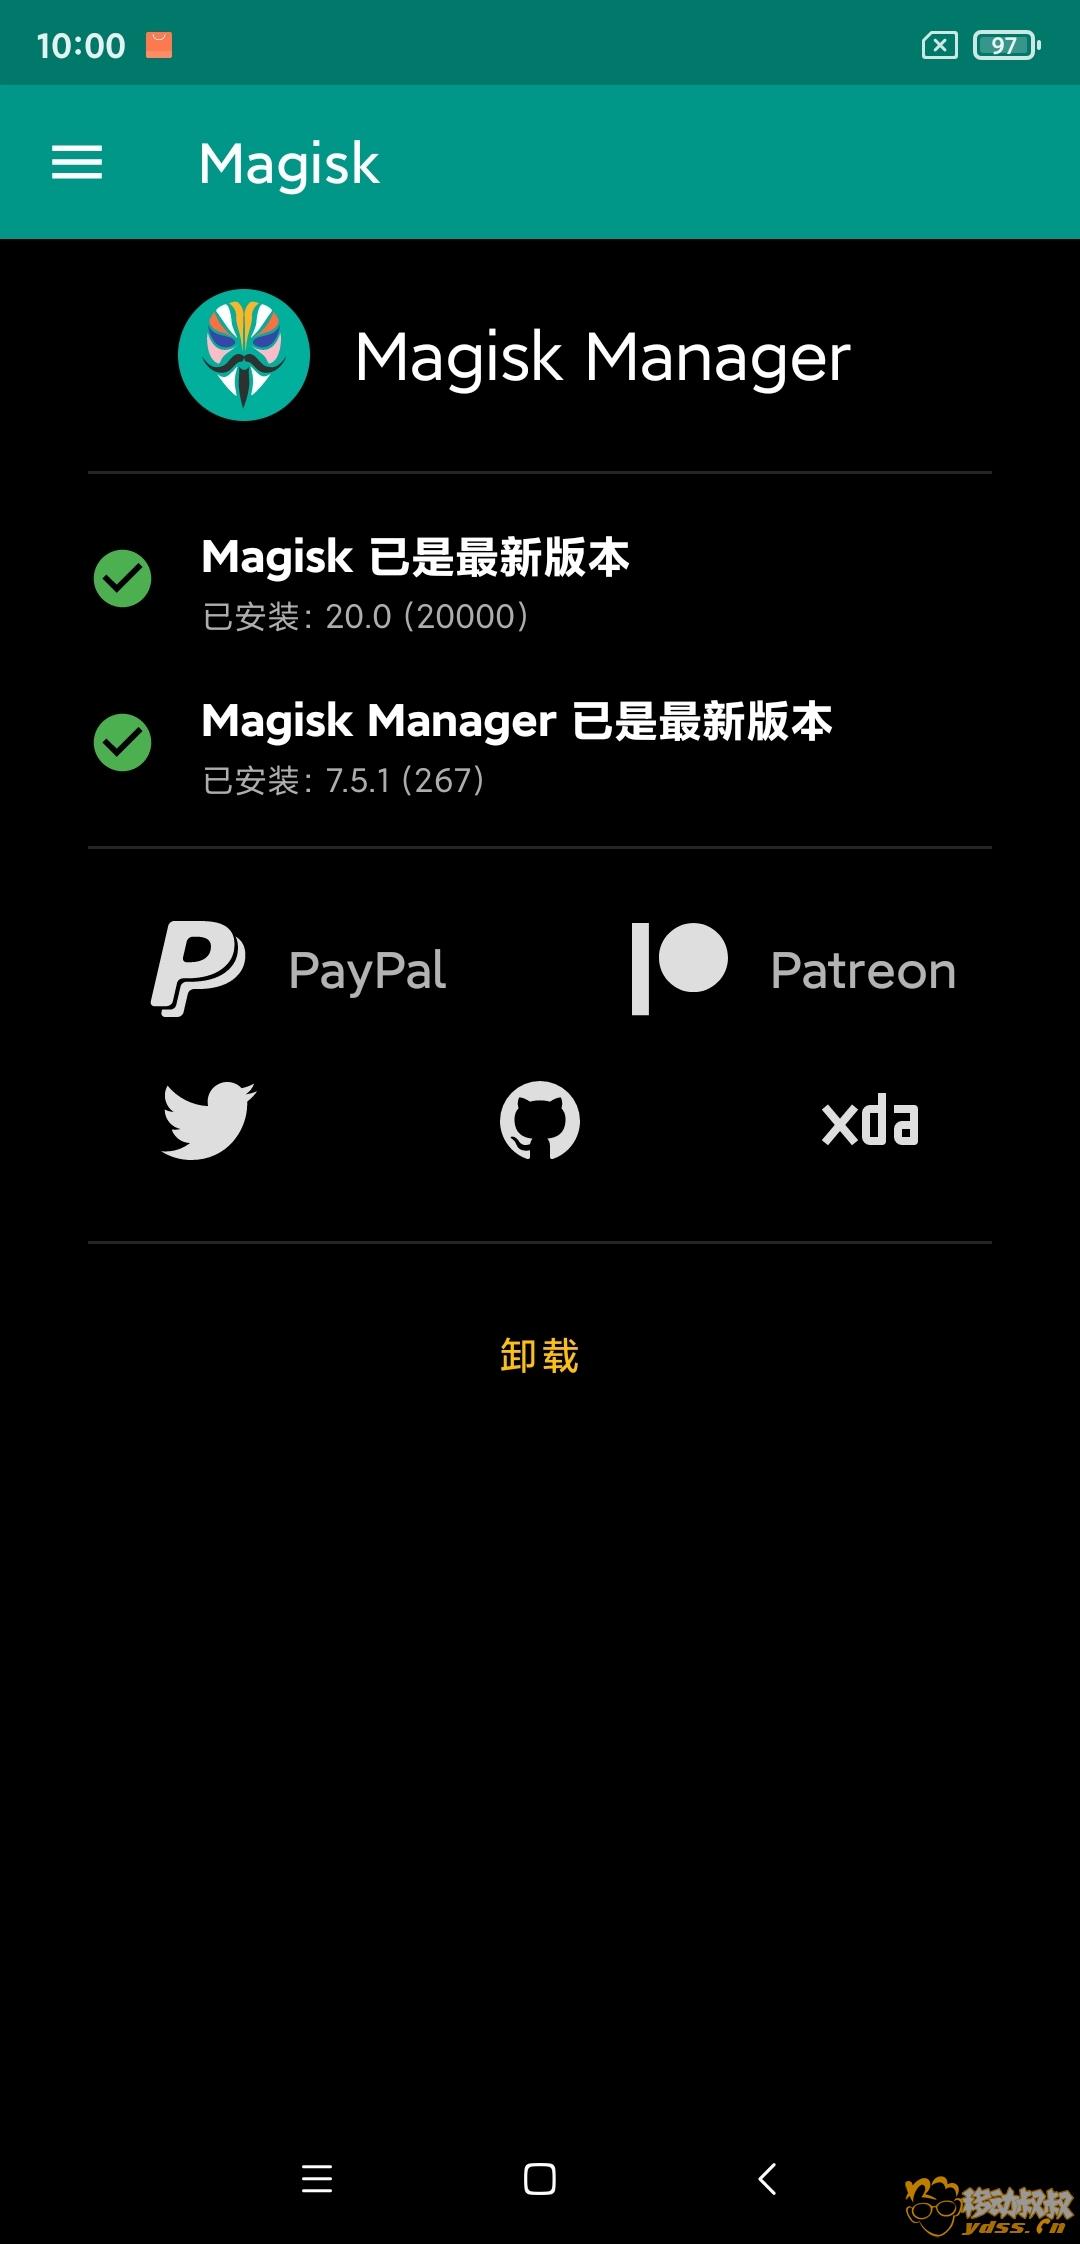 Screenshot_2020-10-17-22-00-15-445_com.topjohnwu.magisk.jpg